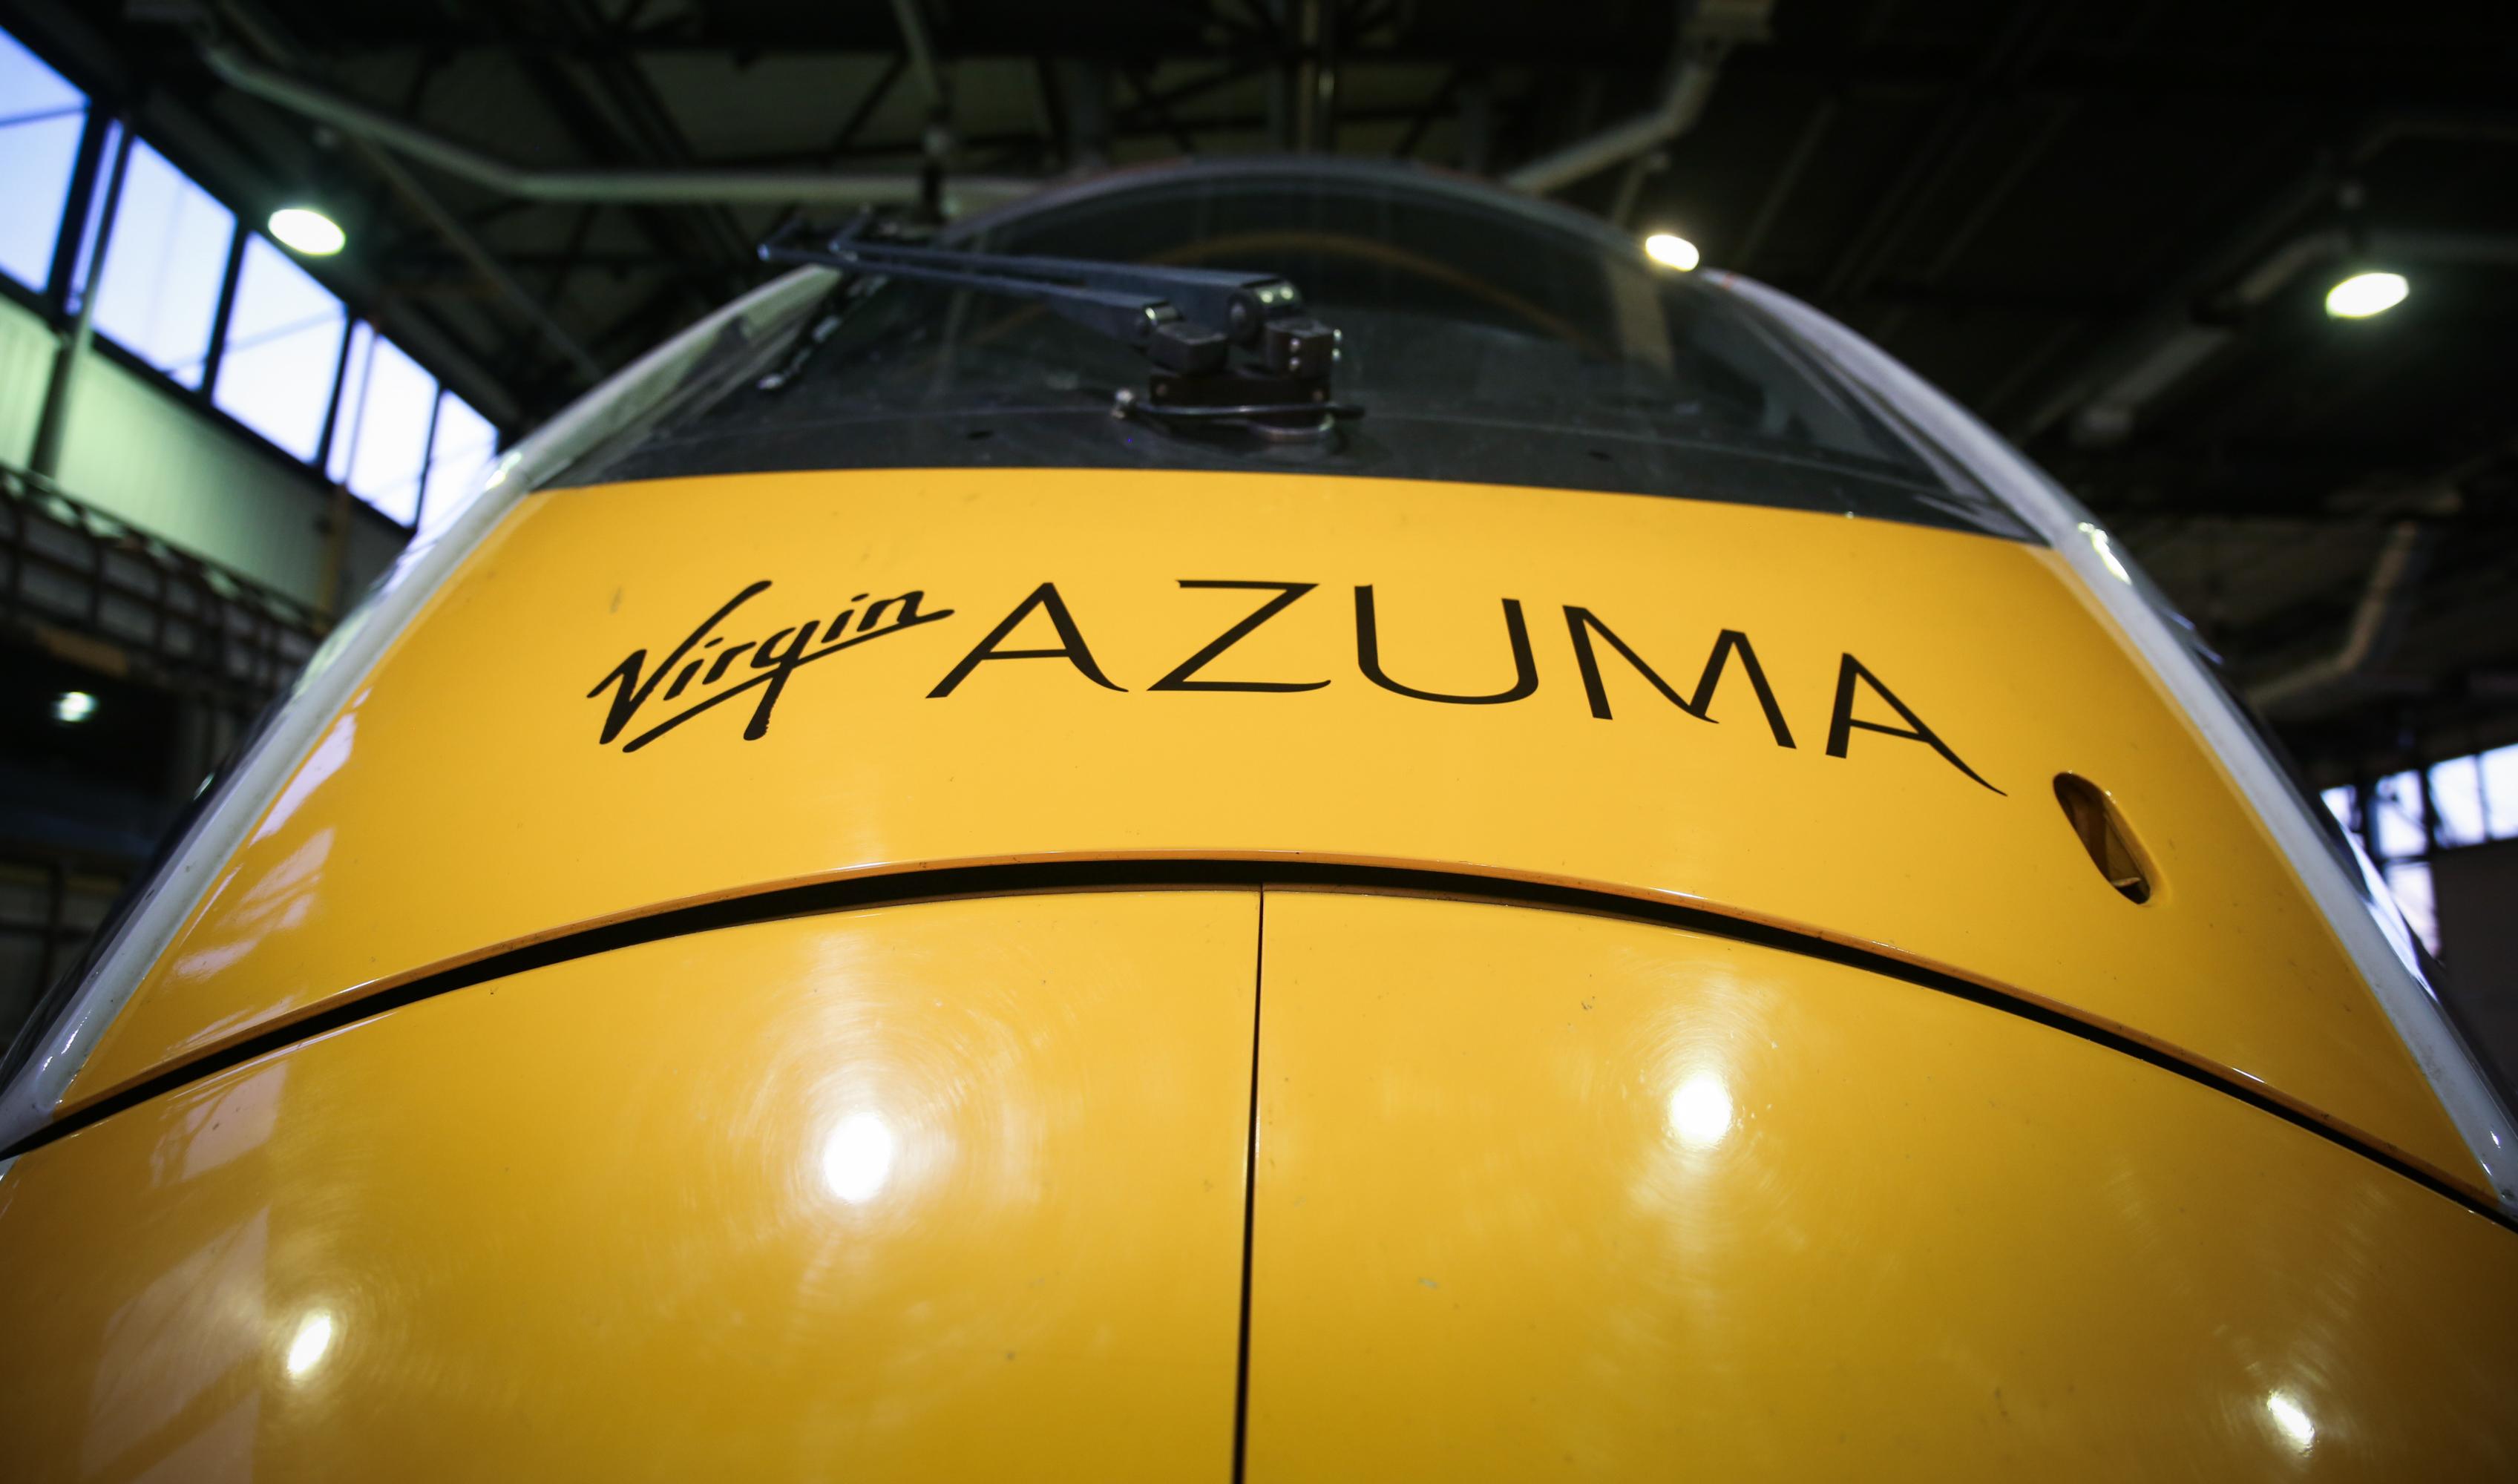 Virgin Azuma